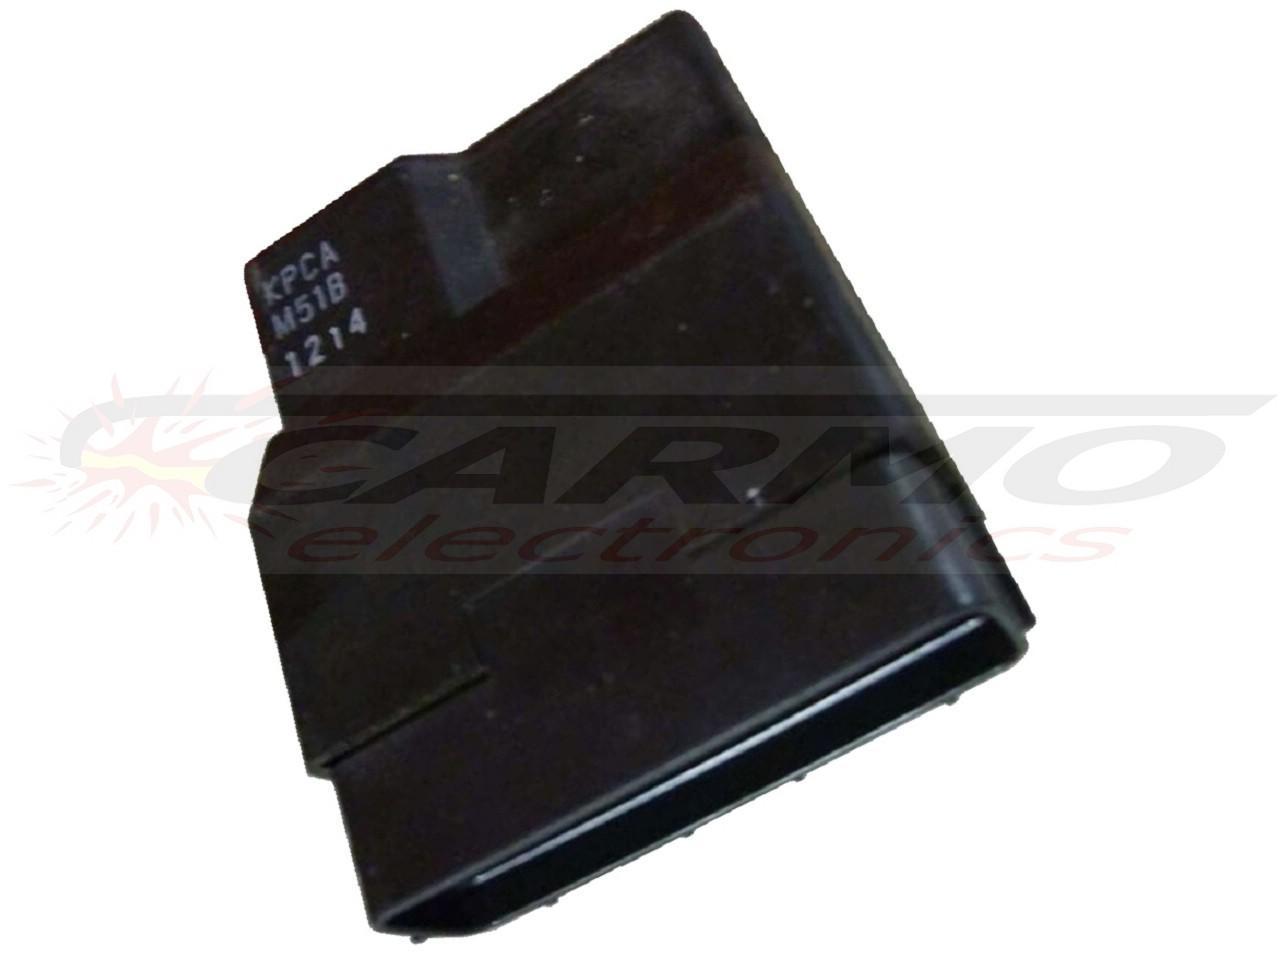 Honda Carmo Electronics The Place For Parts Or Rc51 Wiring Diagram Xl125 Varadero Cdi Einheit Steuergert Zndbox Kpca M51b